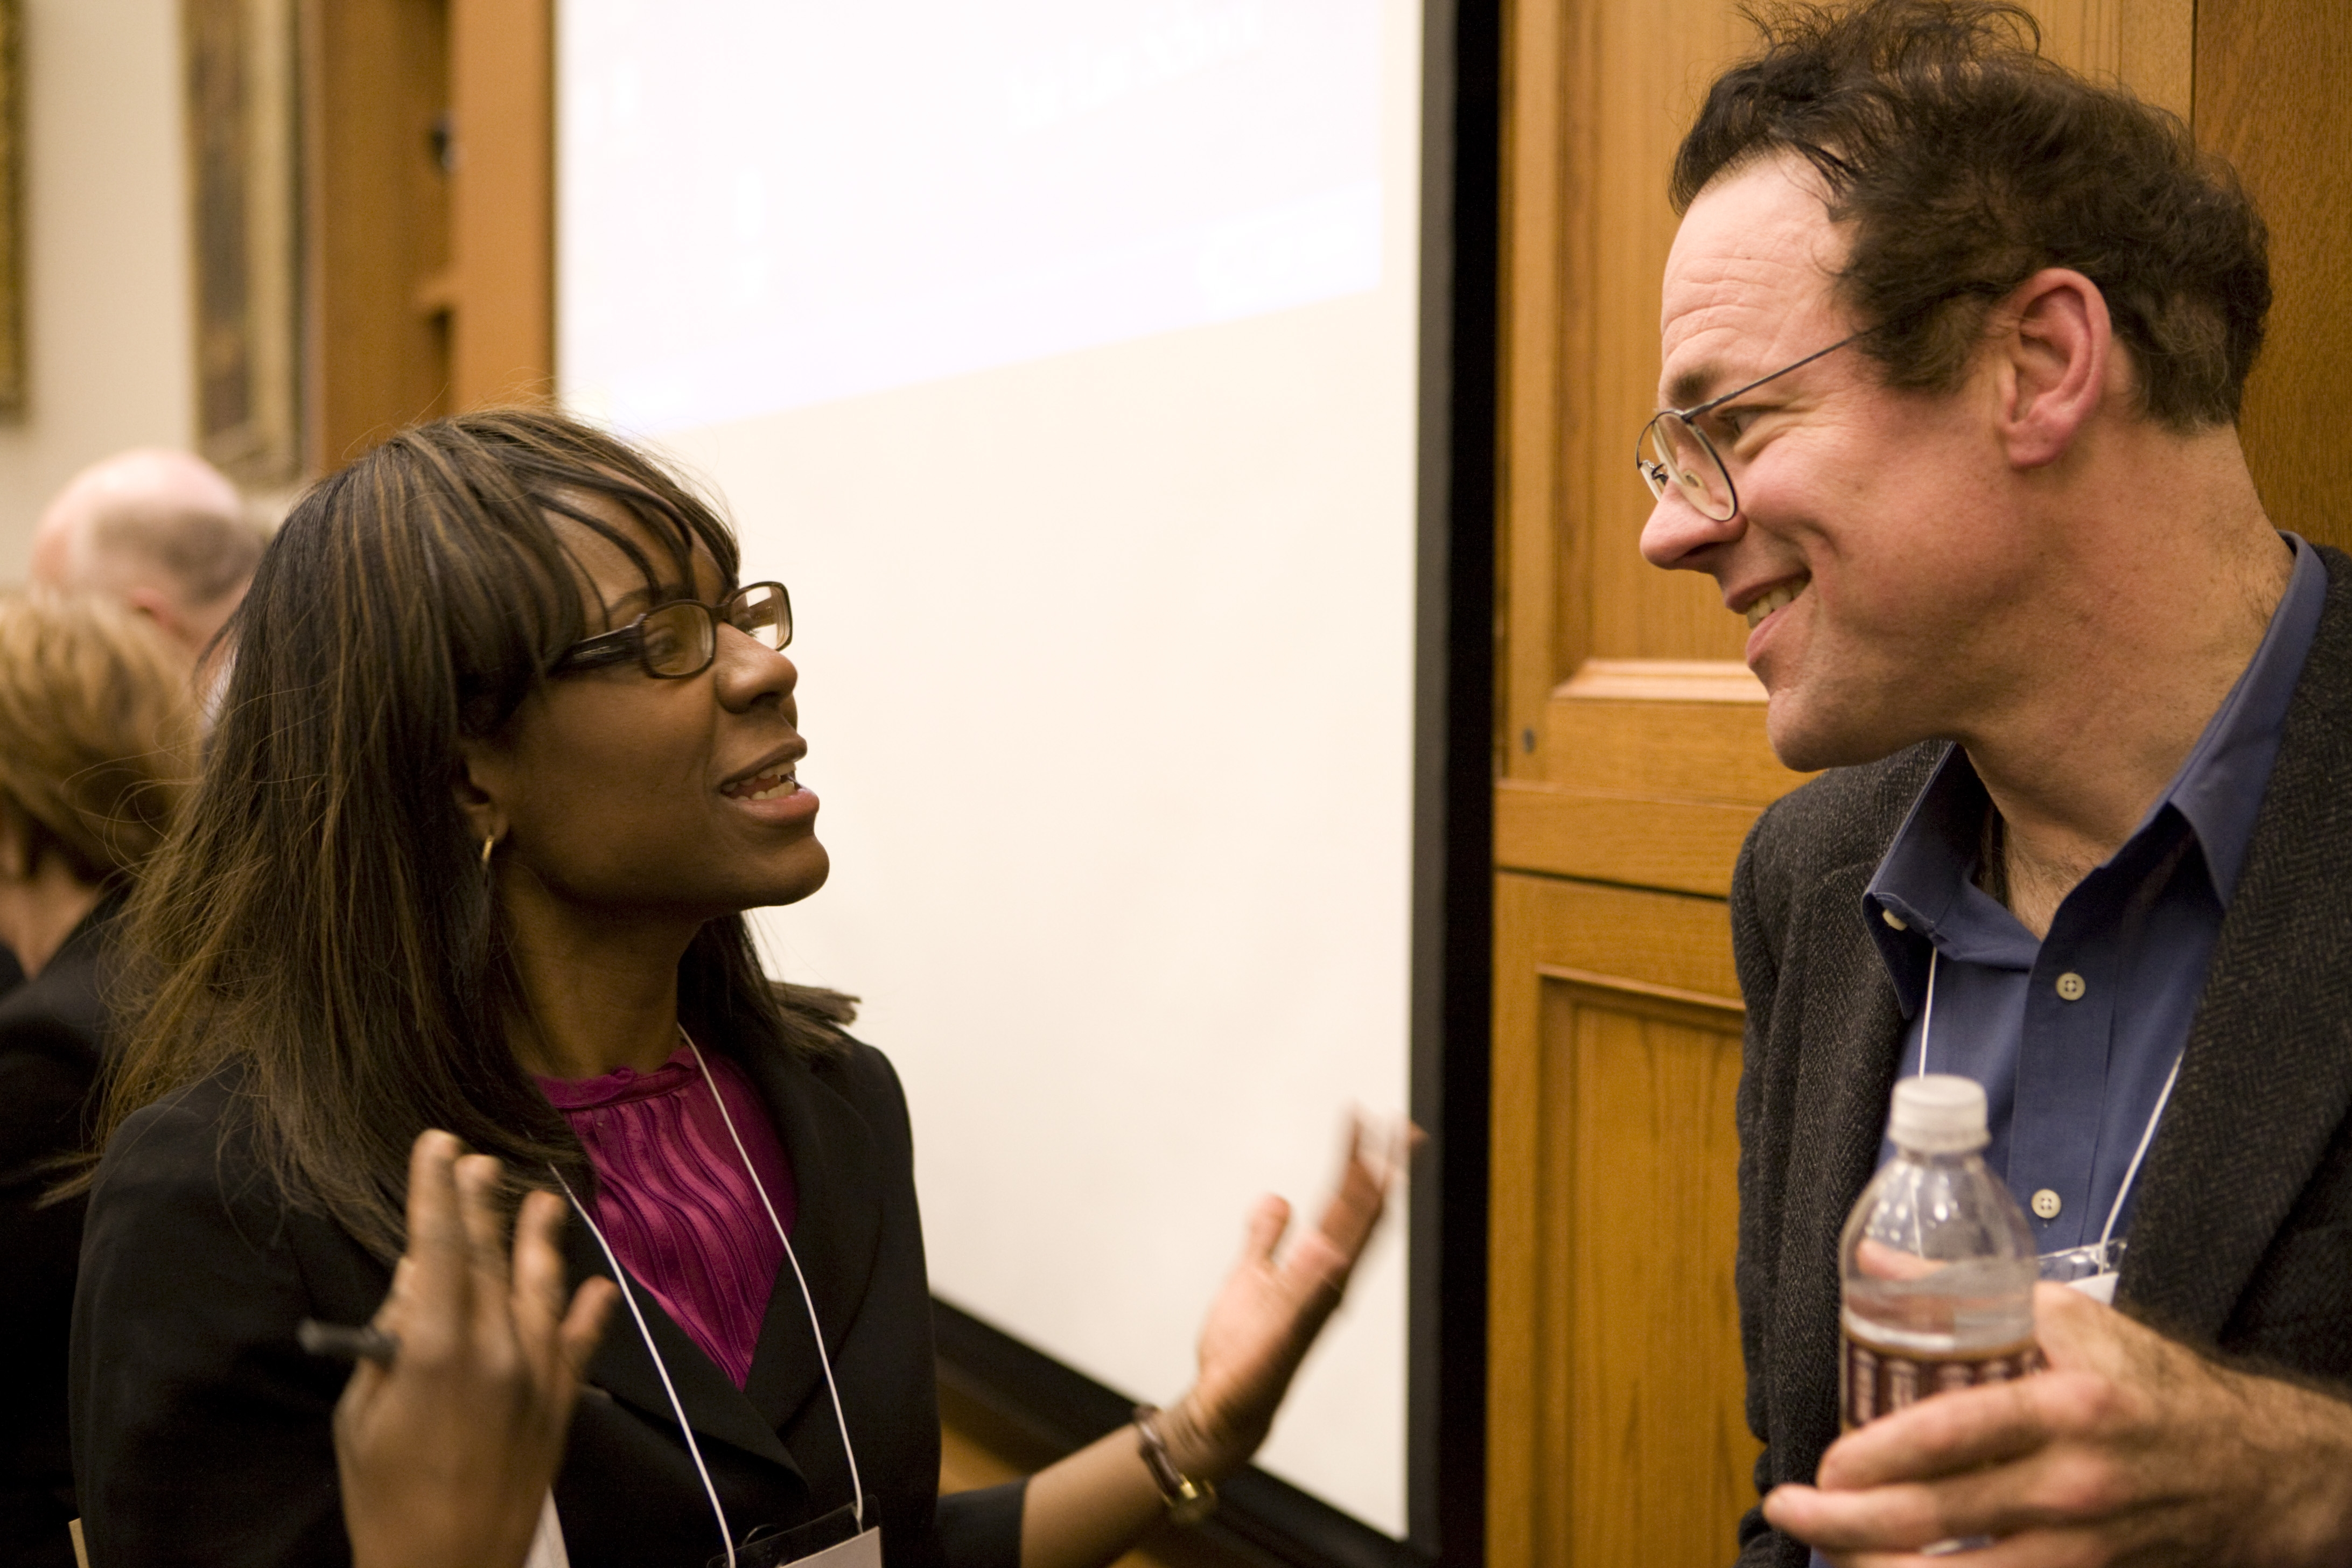 Michigan Law Prof. Alicia Davis Evans '98 and Cornell Law Prof. Robert Hockett LLM '03, JSD '06